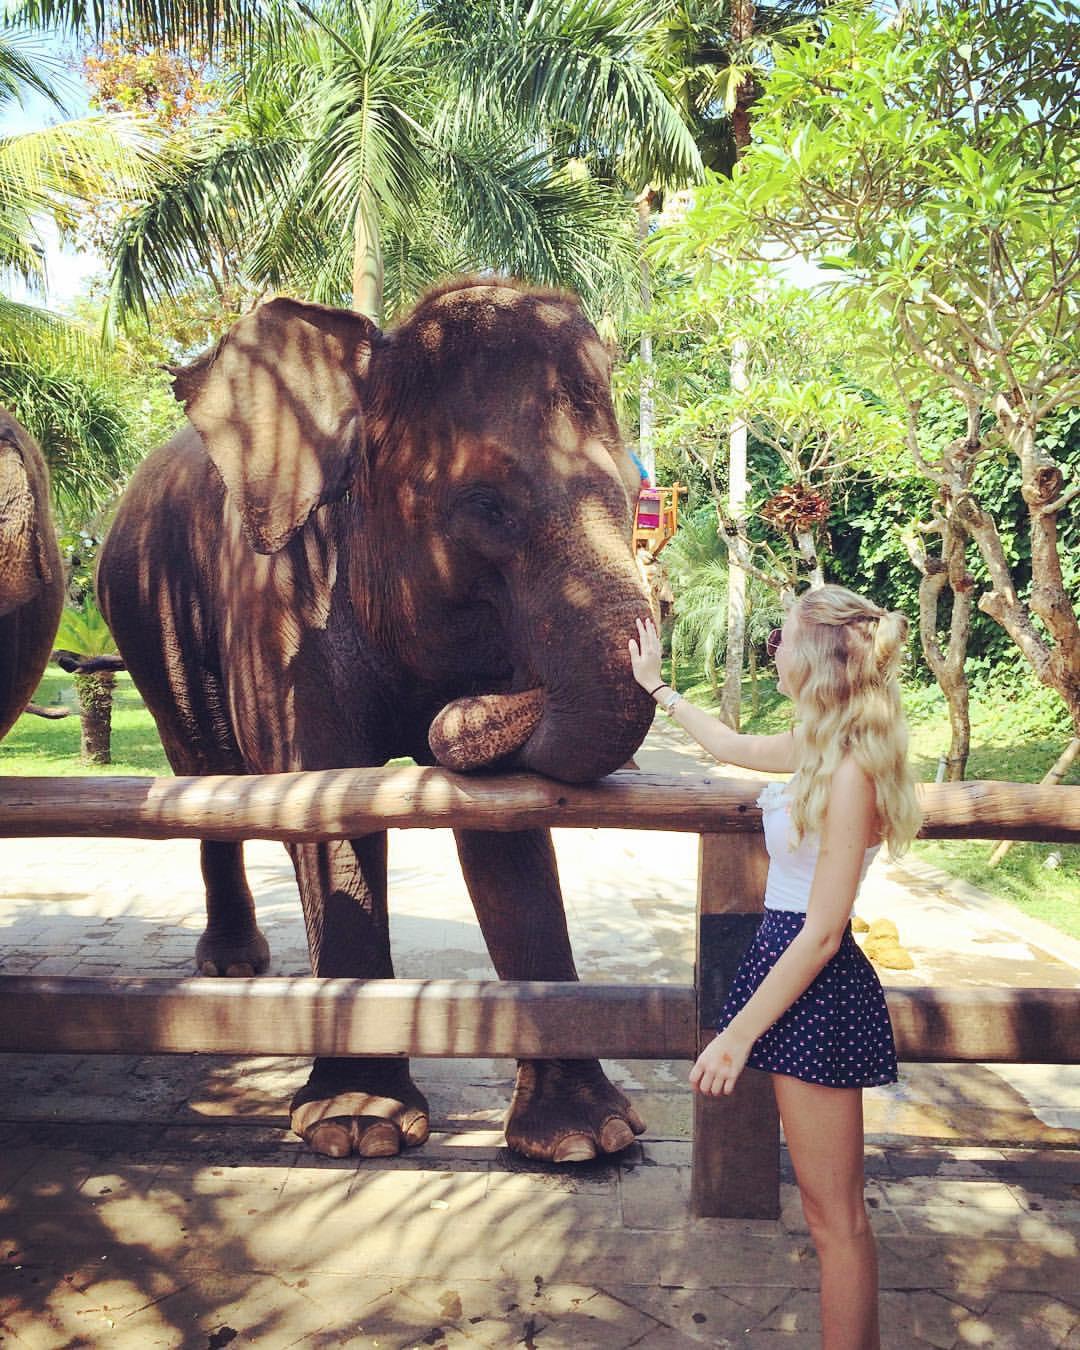 Meeting Elephants at Bali Zoo